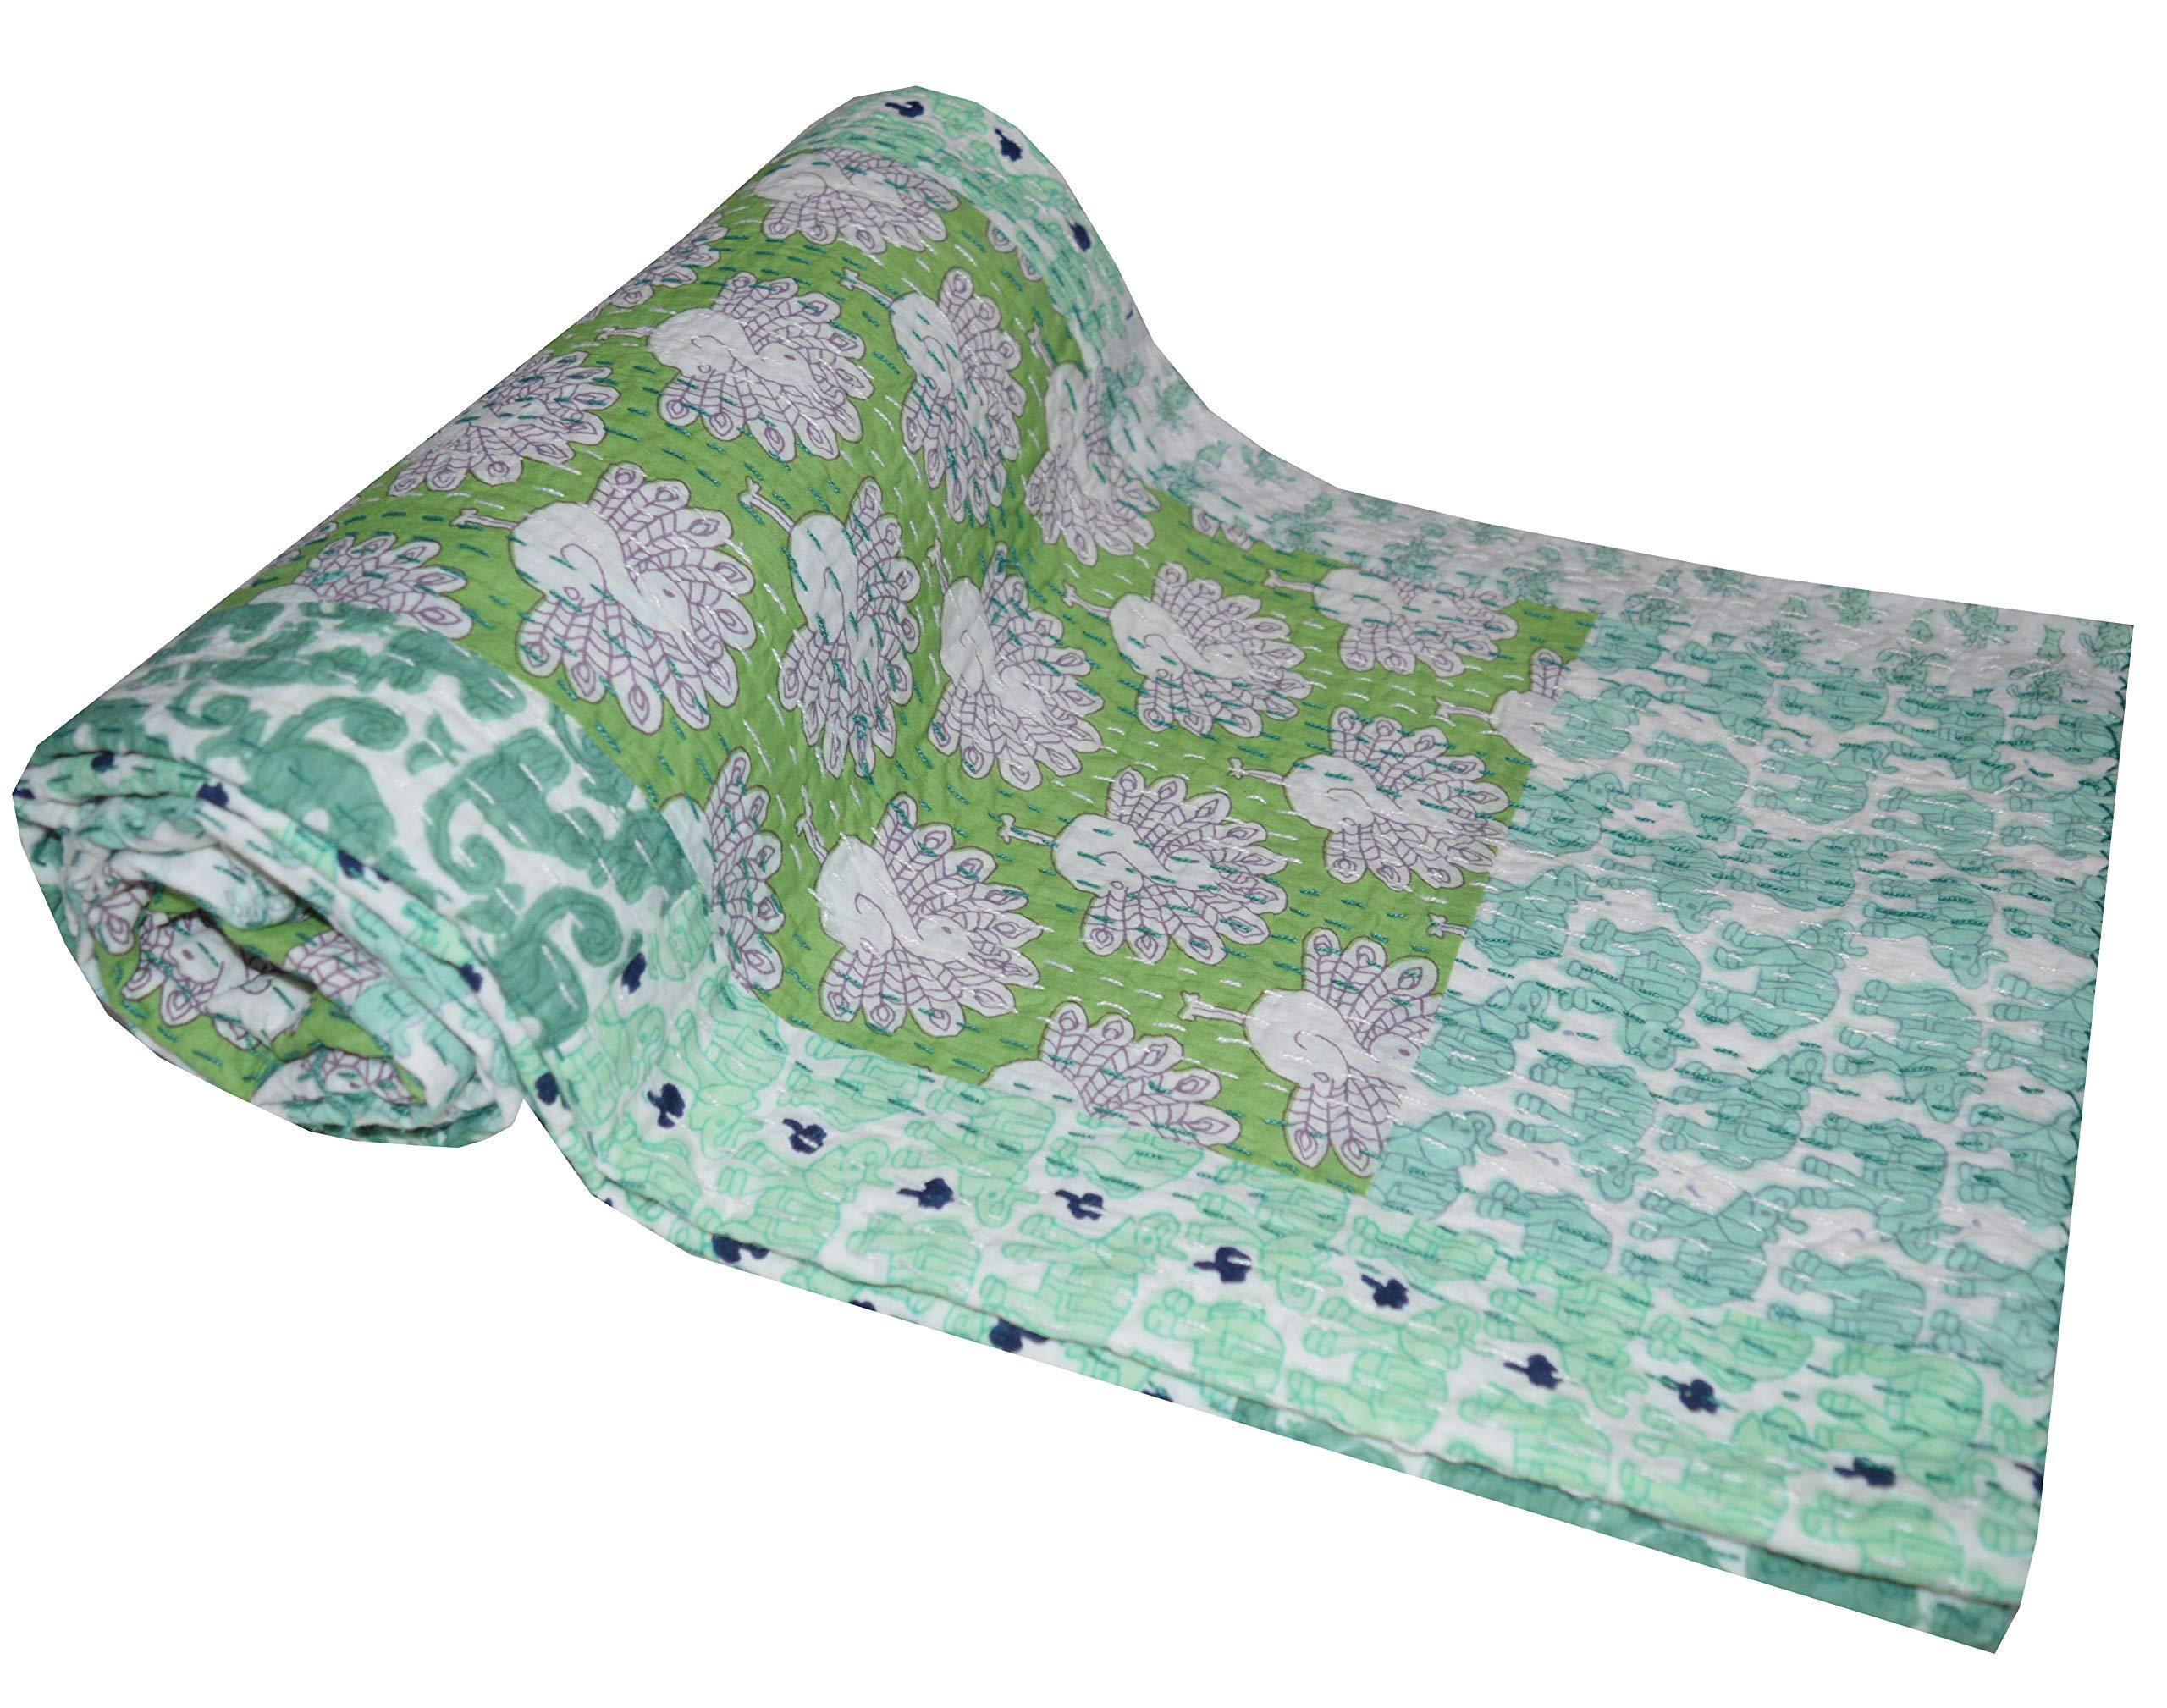 Vintage Indian Twin Kantha Quilt Handmade Patchwork Bedspread Gudri Throw Decor